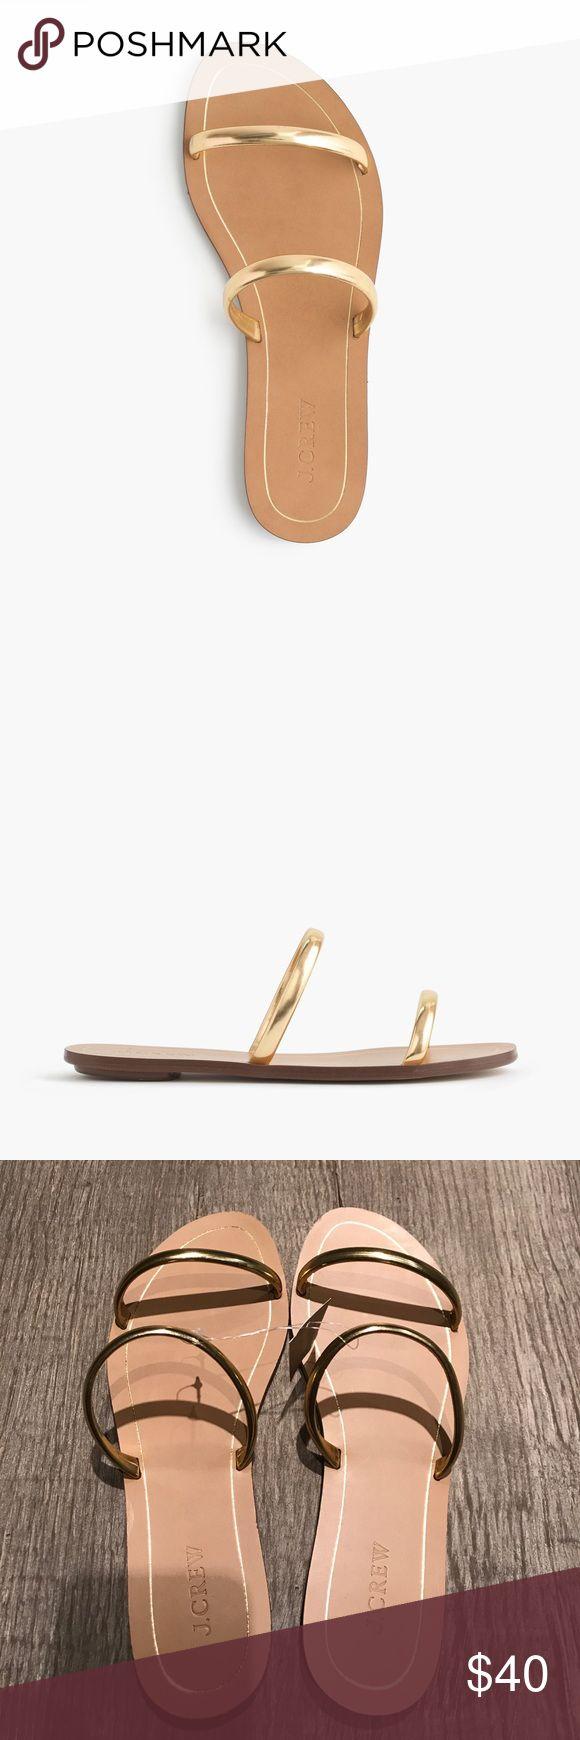 J. Crew Isla metallic slides/sandals size 9. NWT J. Crew Isla metallic slides/sandals size 9. NWT J. Crew Shoes Sandals